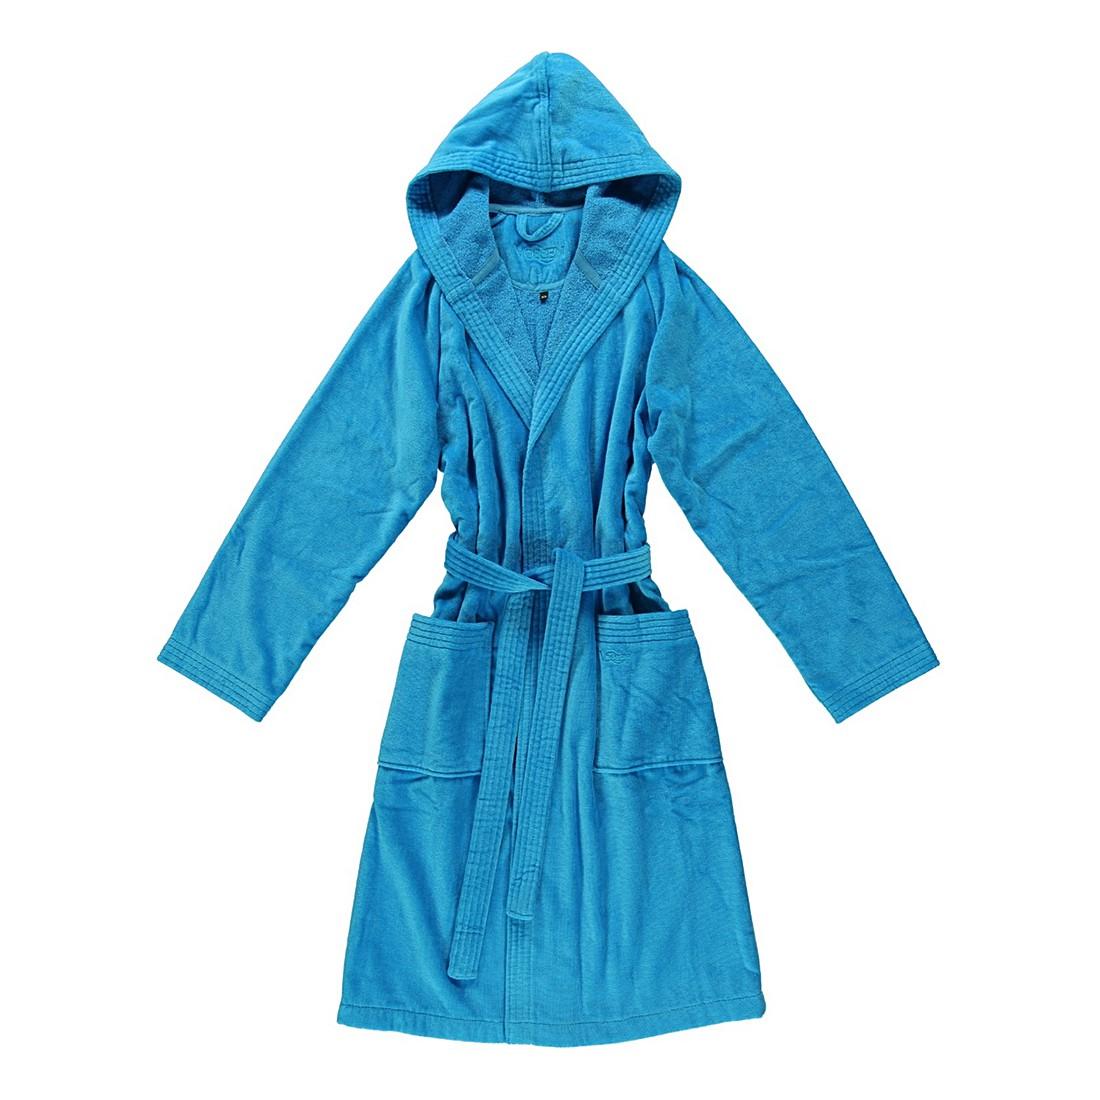 Bademantel Texas – Damen – Velours – 100% Baumwolle turquoise – 557 – XXL, Vossen jetzt bestellen